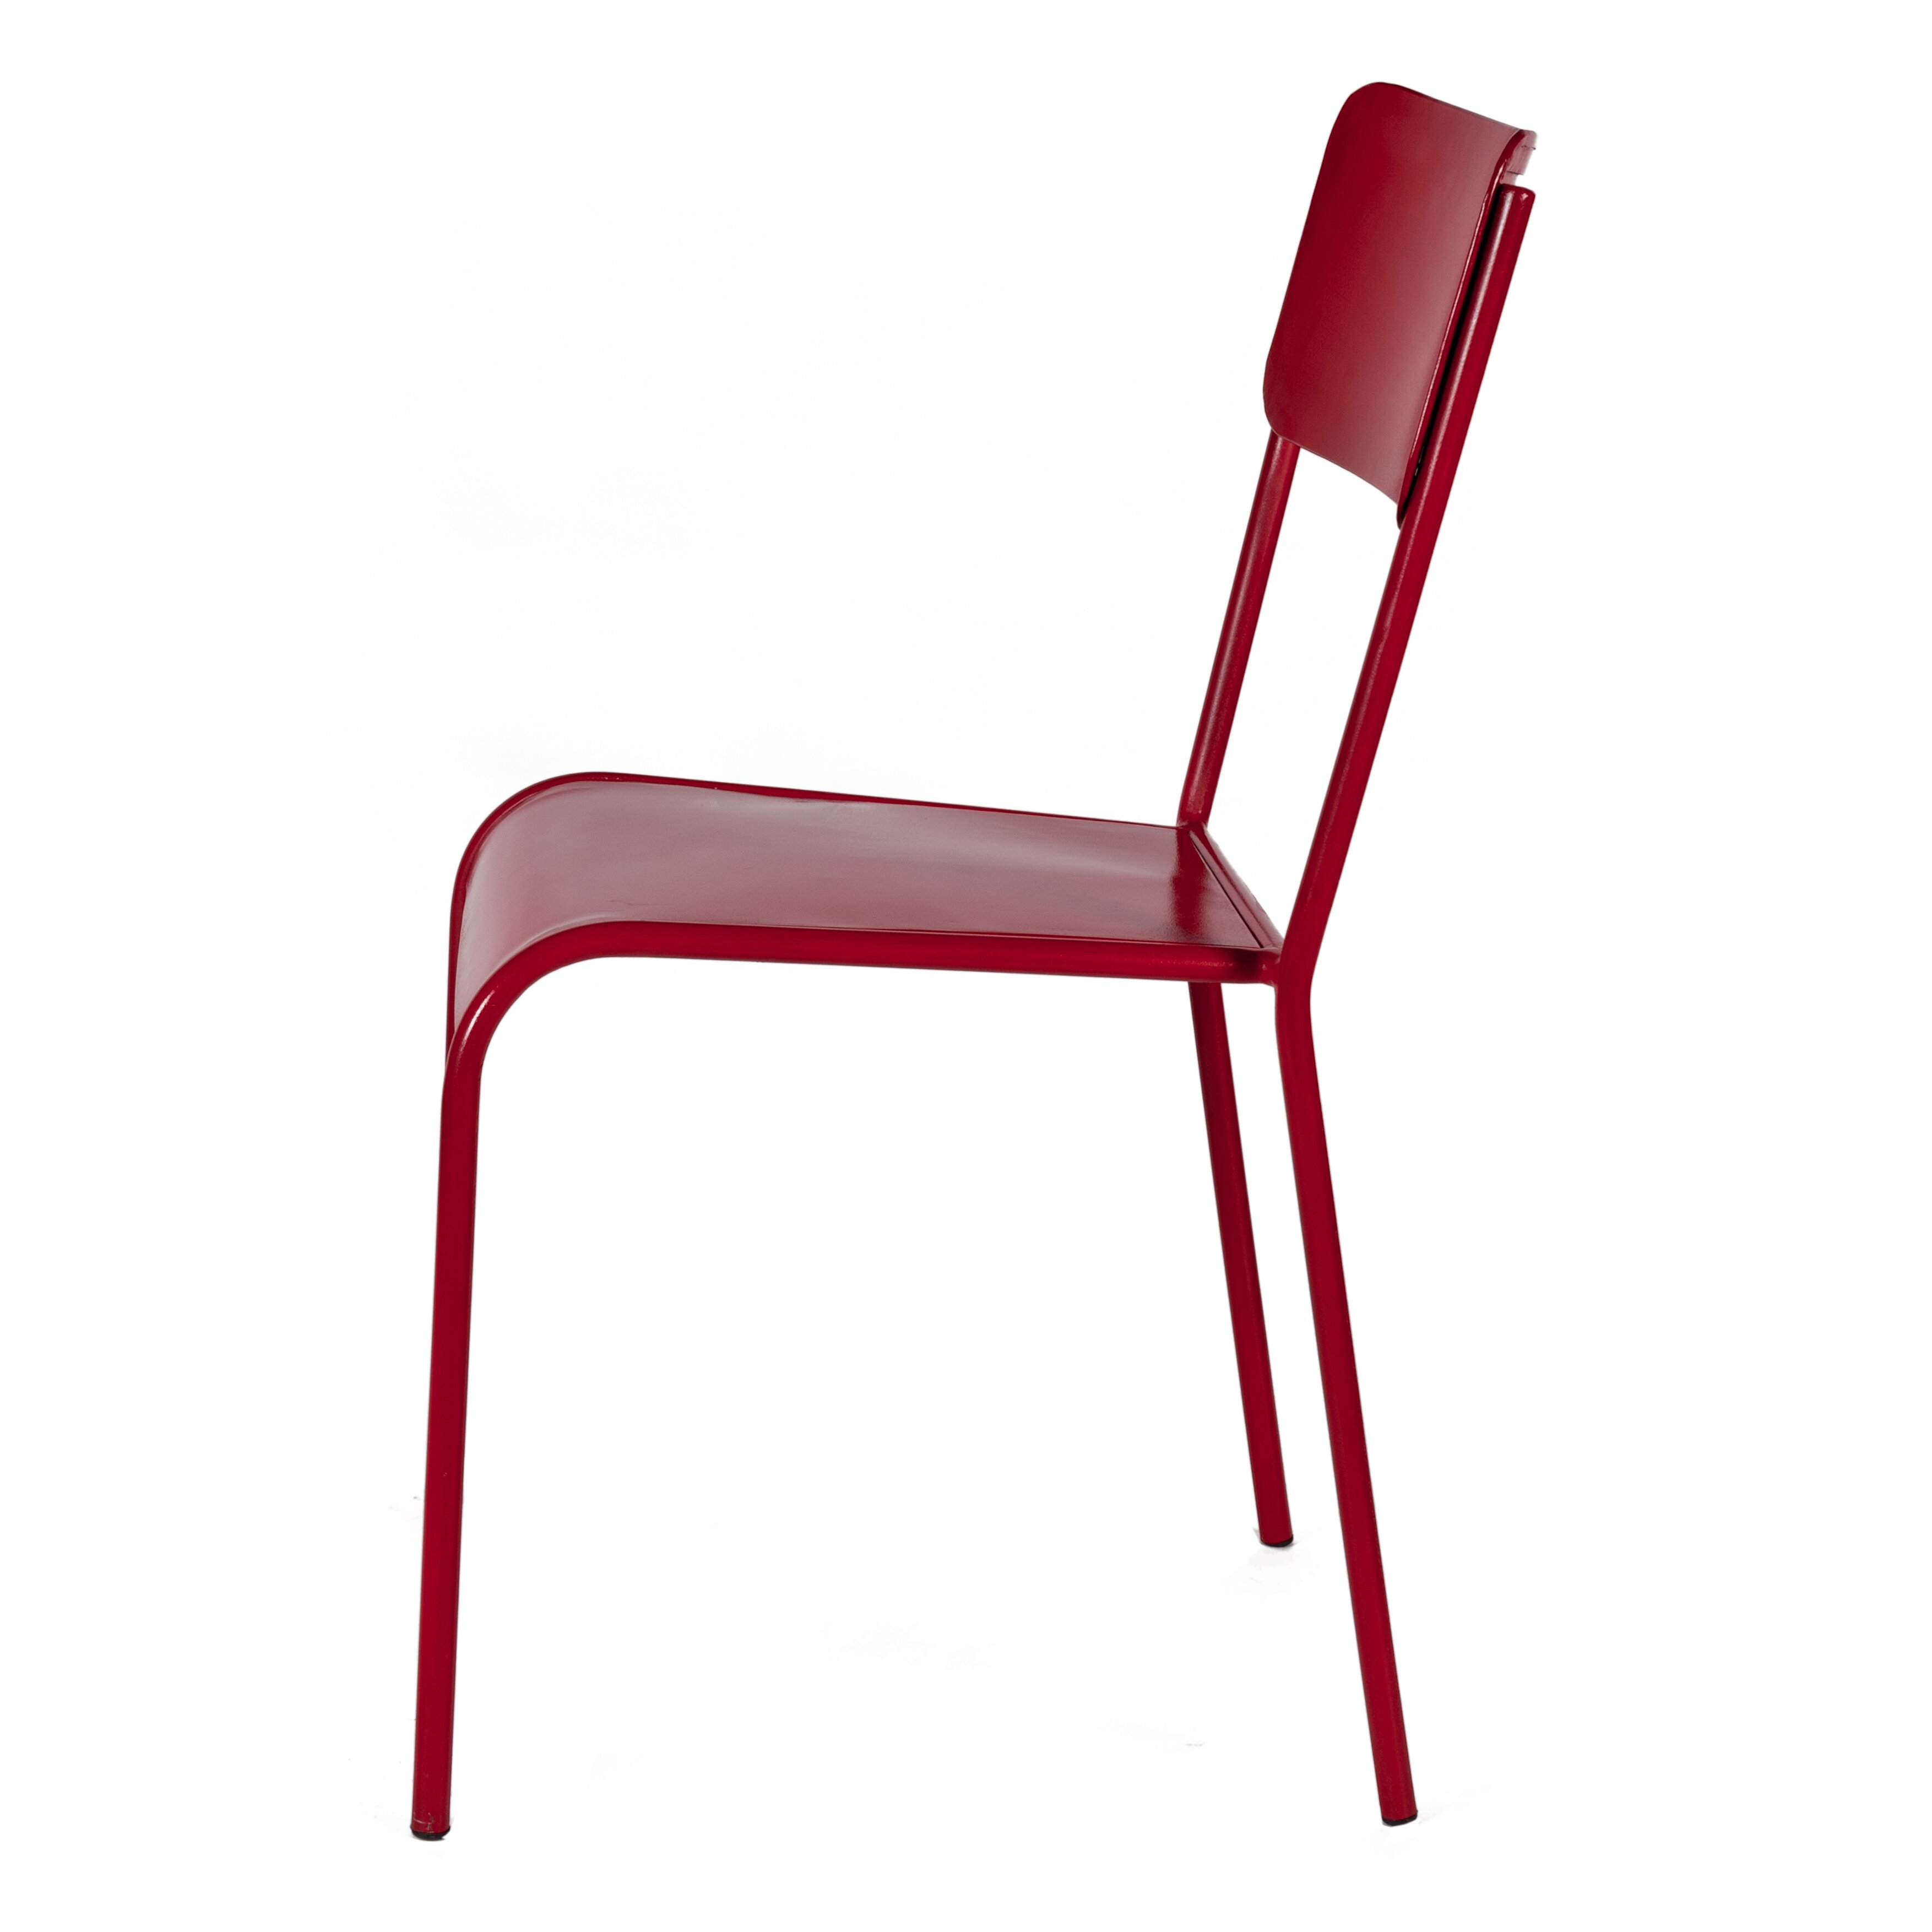 SIT Möbel Airman Dining Chair & Reviews  Wayfair UK